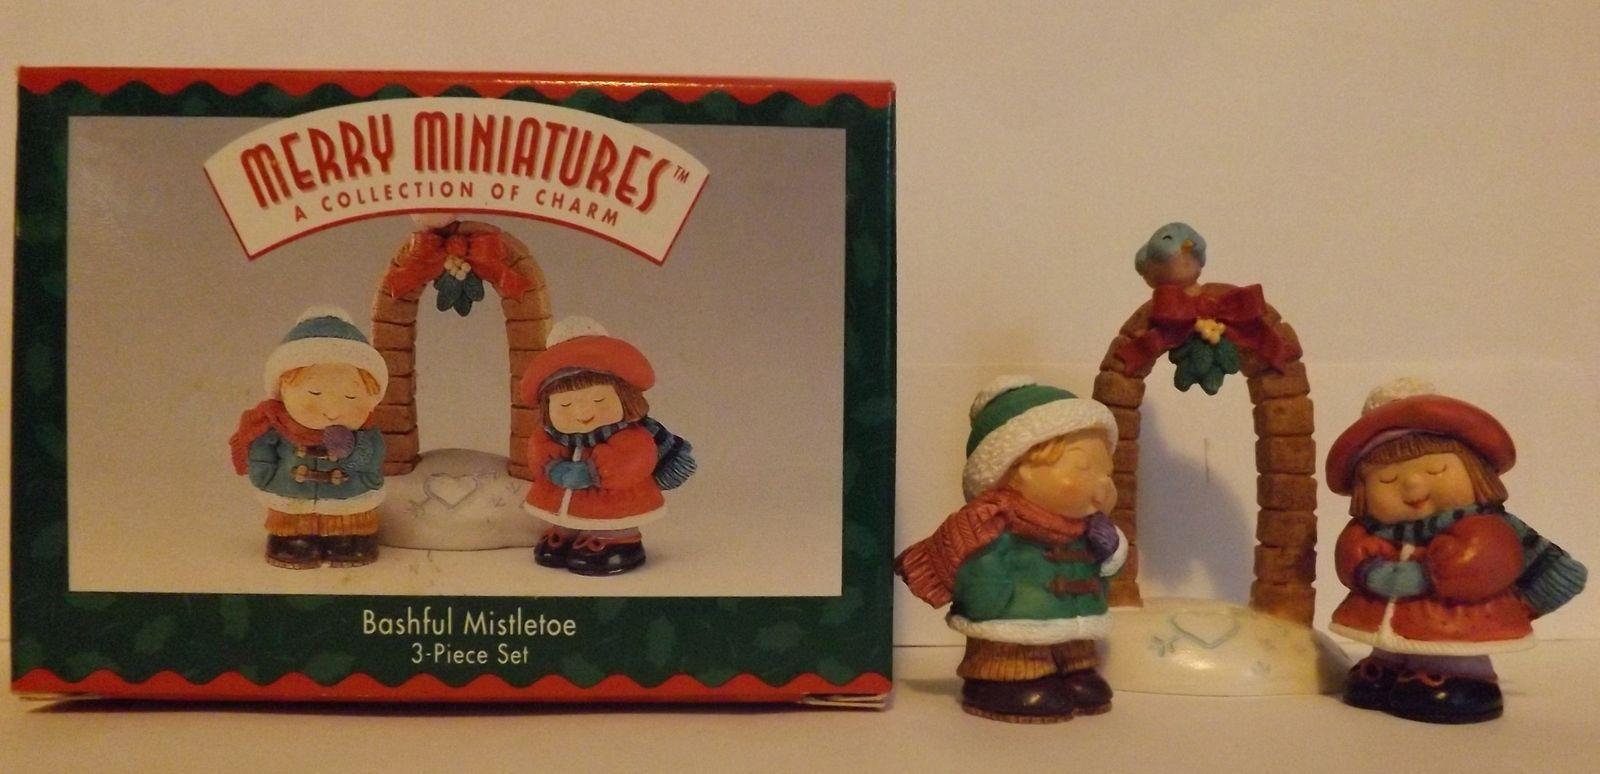 Hallmark Merry Miniatures Bashful Mistletoe 3-Piece Set Holidays 1996